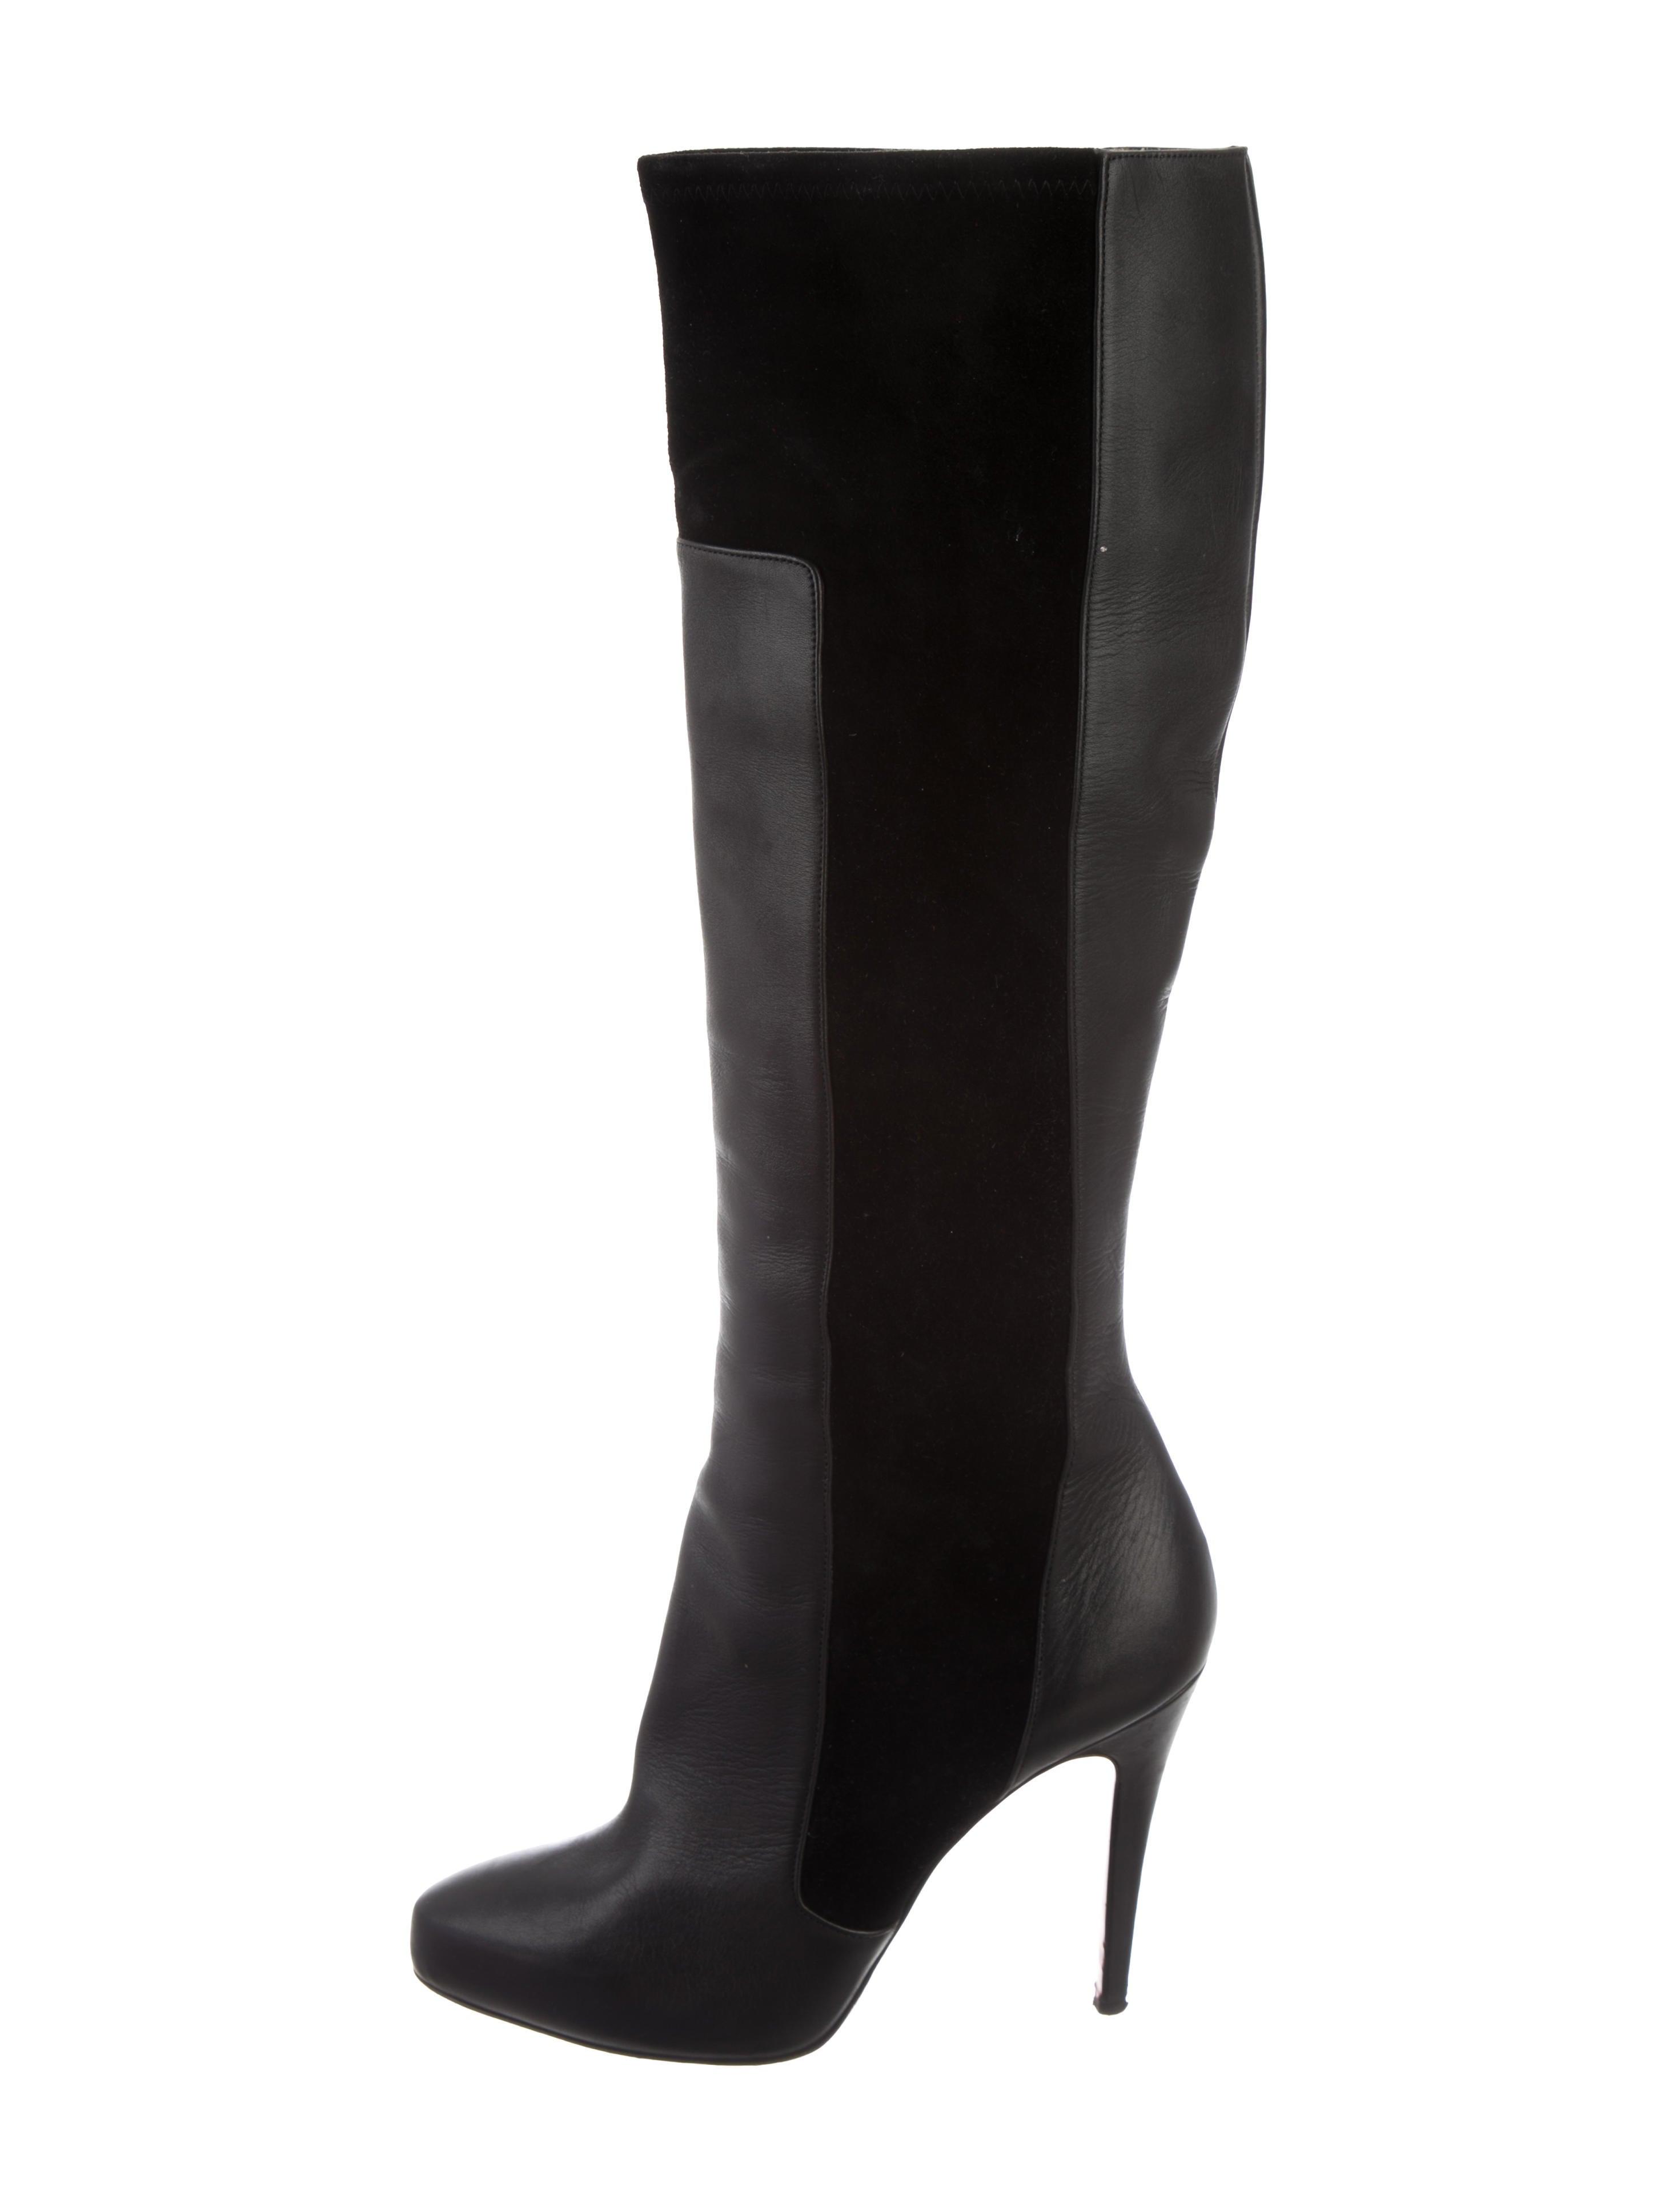 a34ceb4ad60 YSA Knee-High Boots